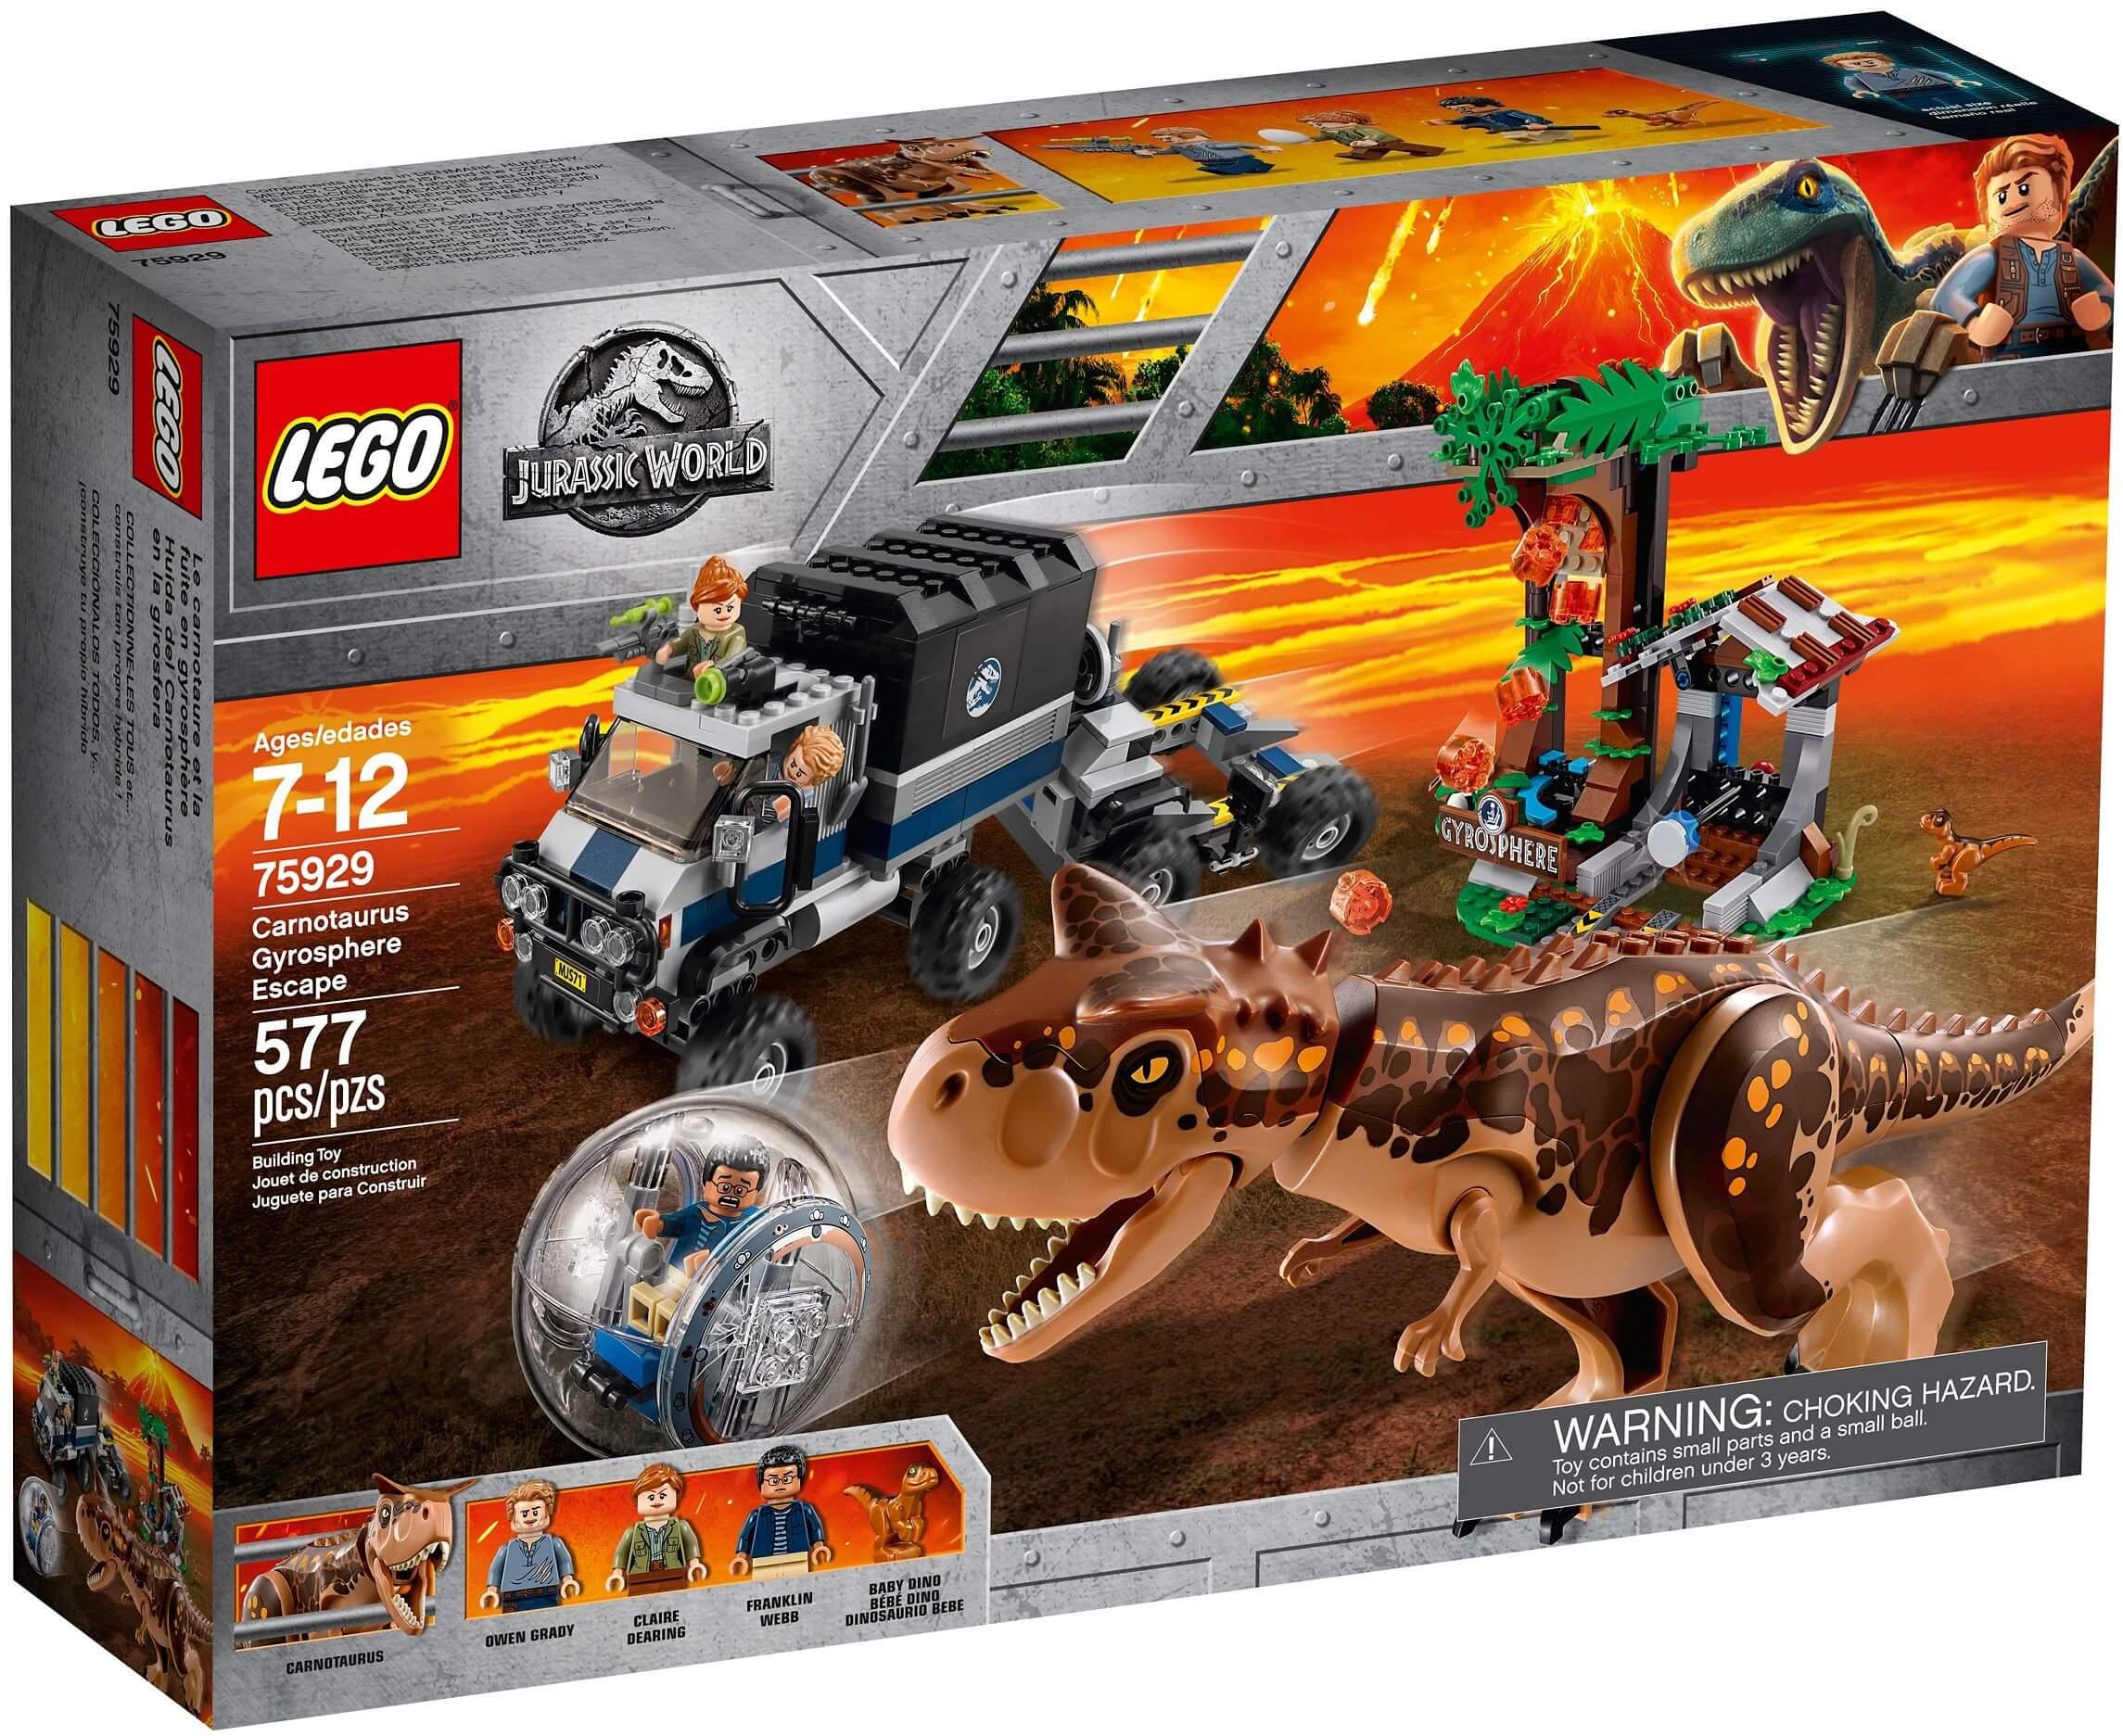 Mua đồ chơi LEGO 75929 - LEGO Khủng Long Jurassic World 75929 - Đội Xe Săn Khủng Long Carnotaurus (LEGO 75929 Carnotaurus Gyrosphere Escape)